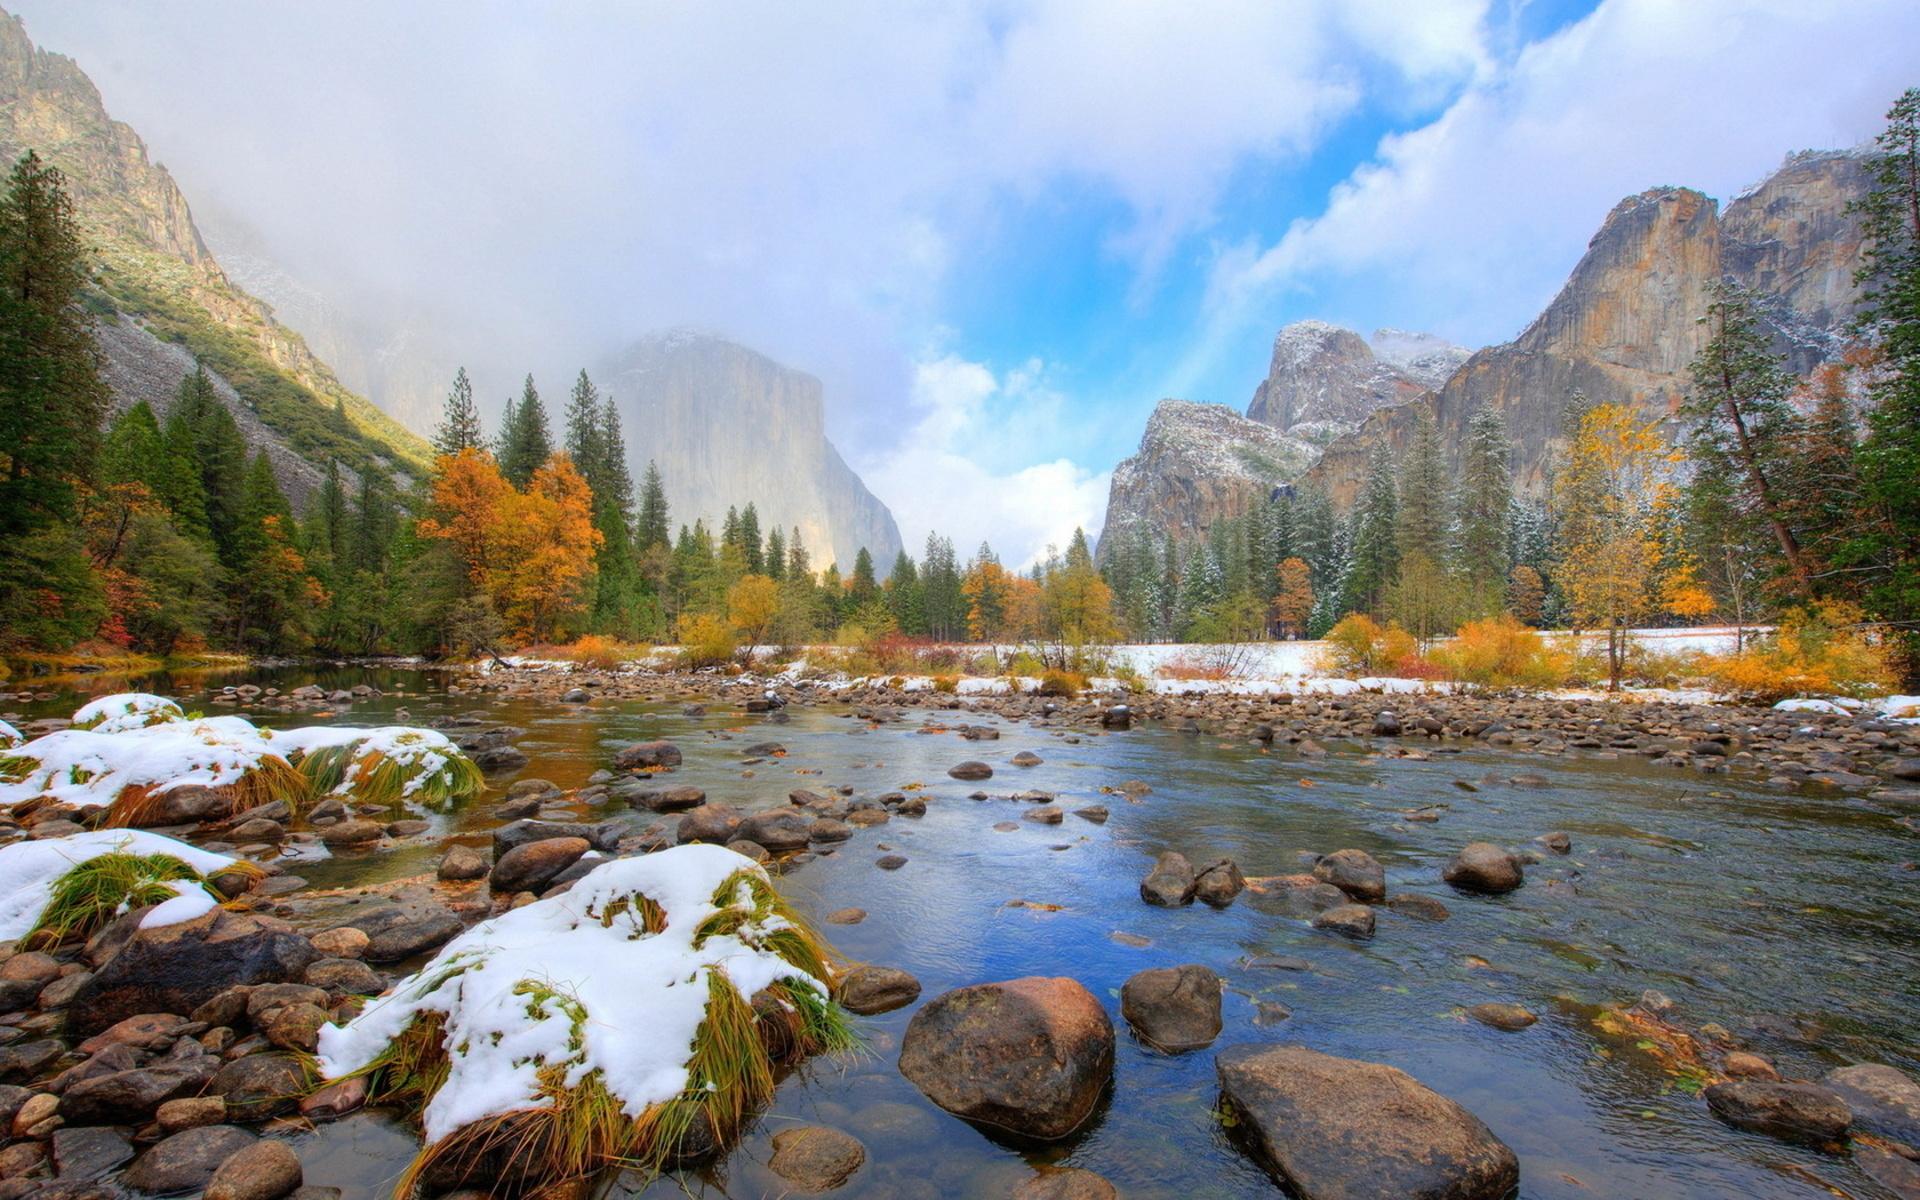 wallpaper landscape winter autumn - photo #43